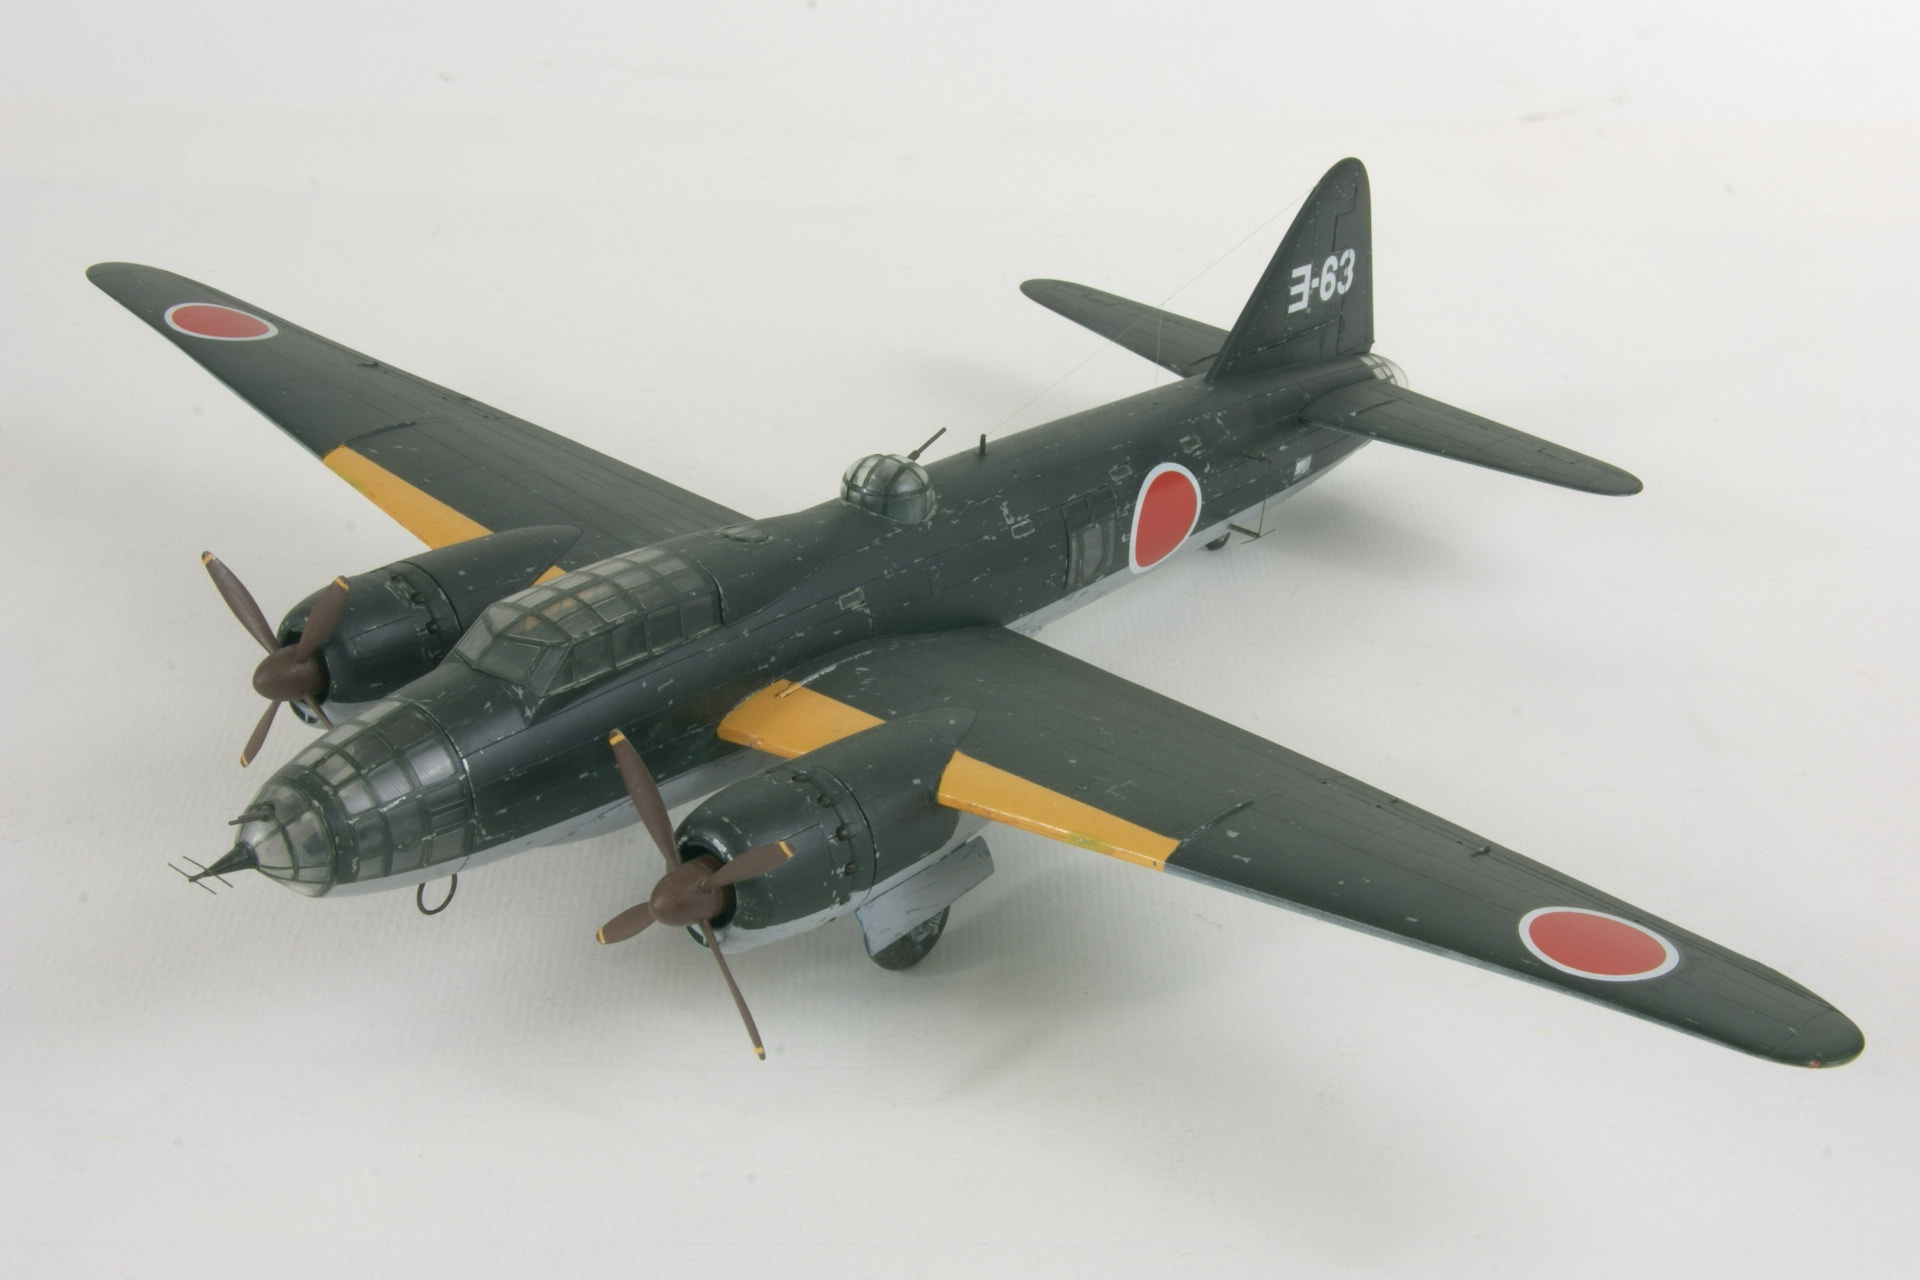 Mitsubishi g4m2a model 24 betty 1 1